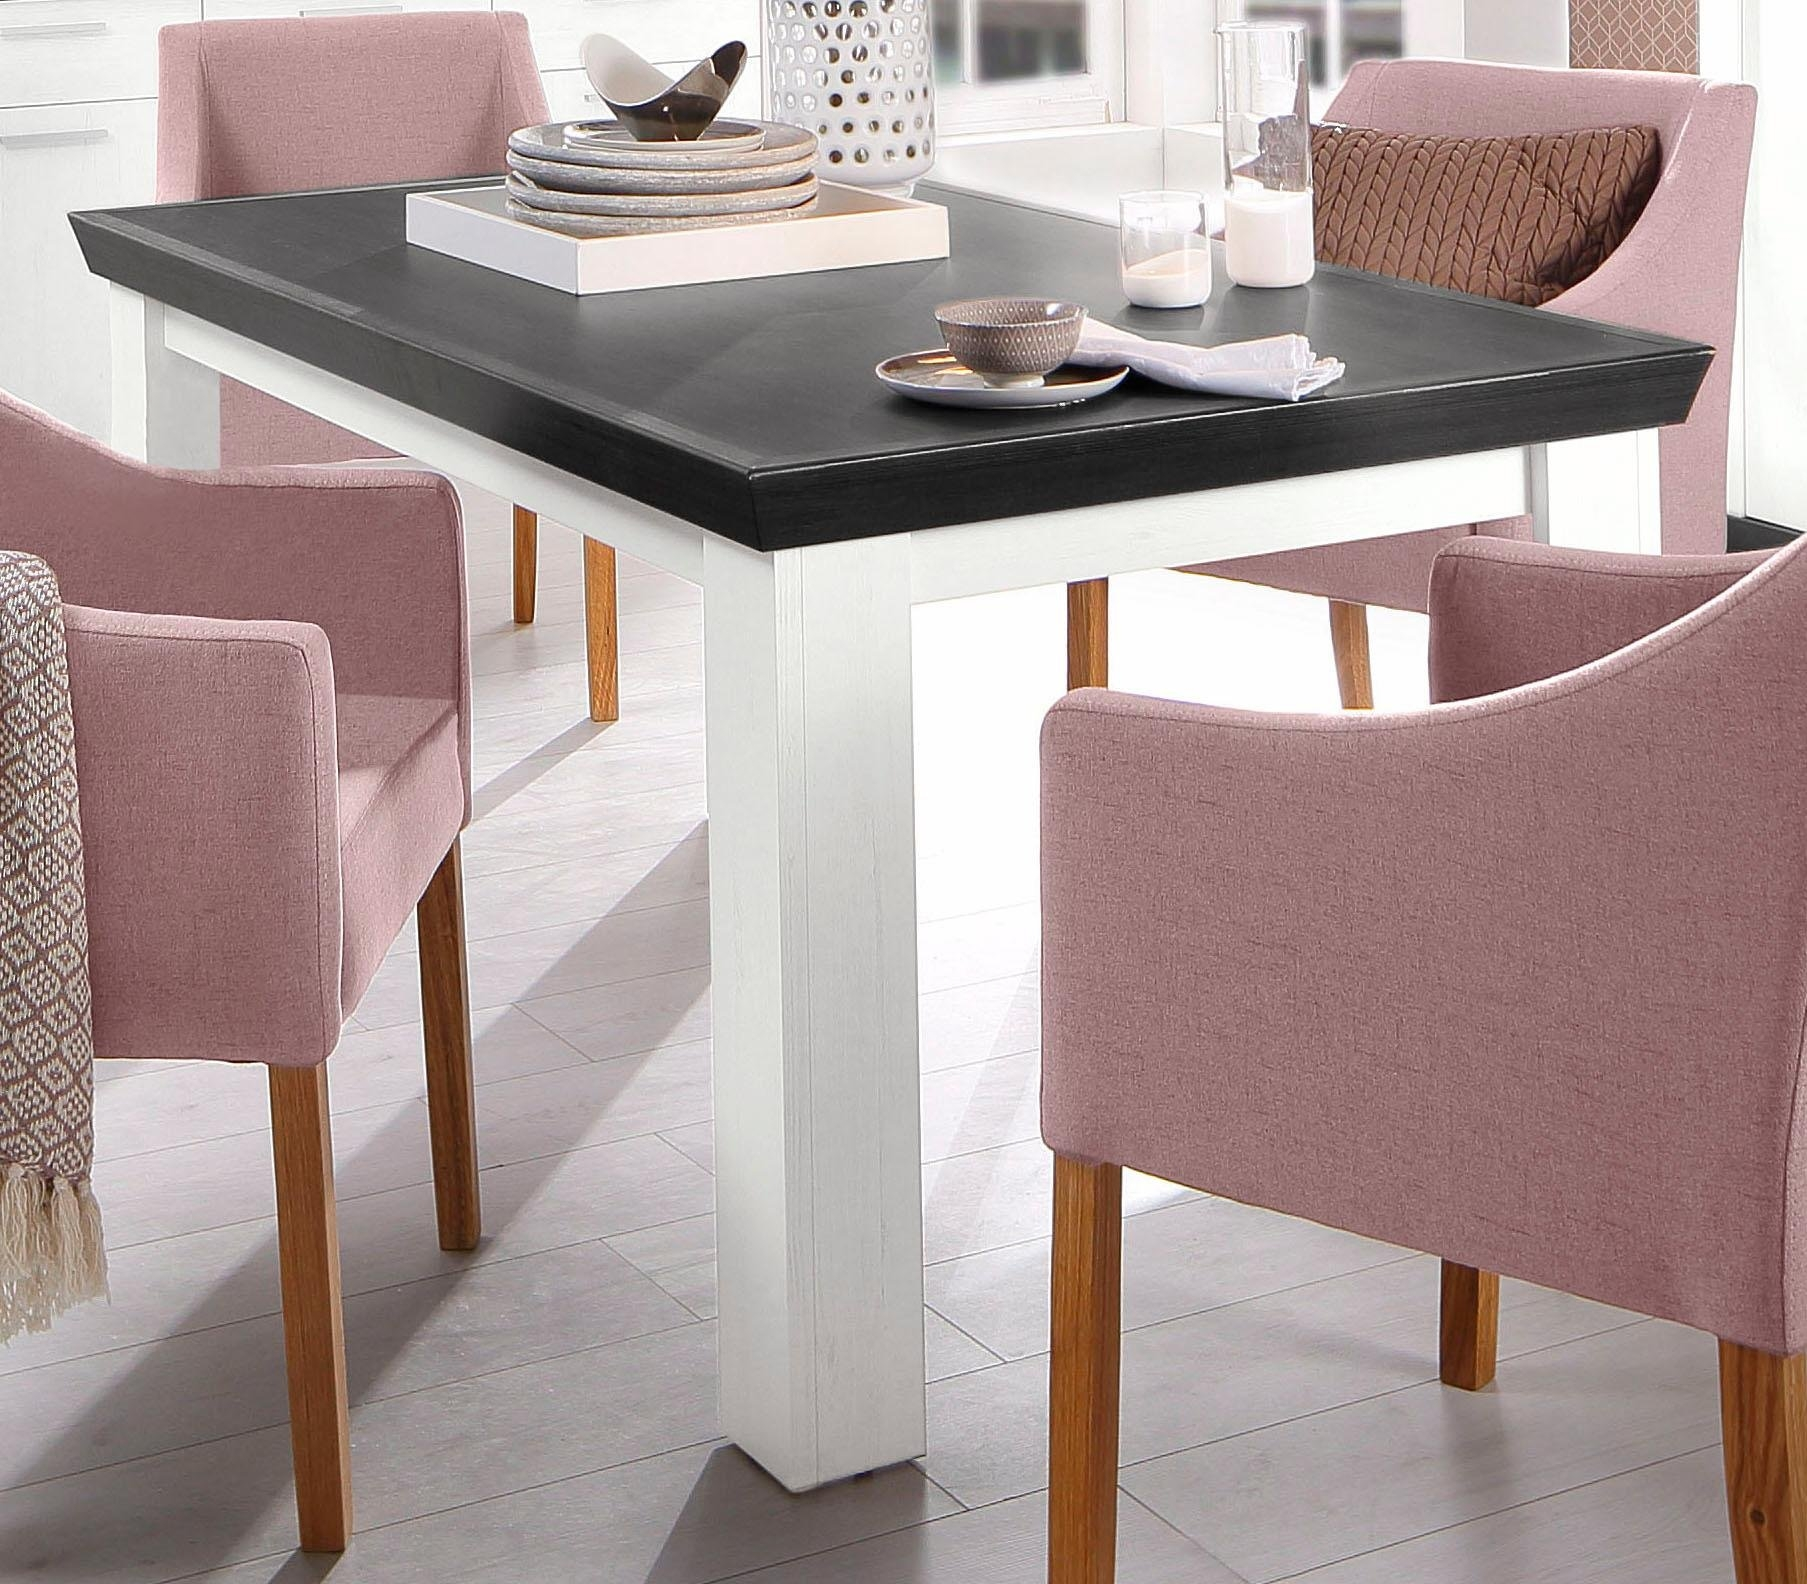 Home Affaire eettafel »Siena«, breedte 160 cm nu online bestellen